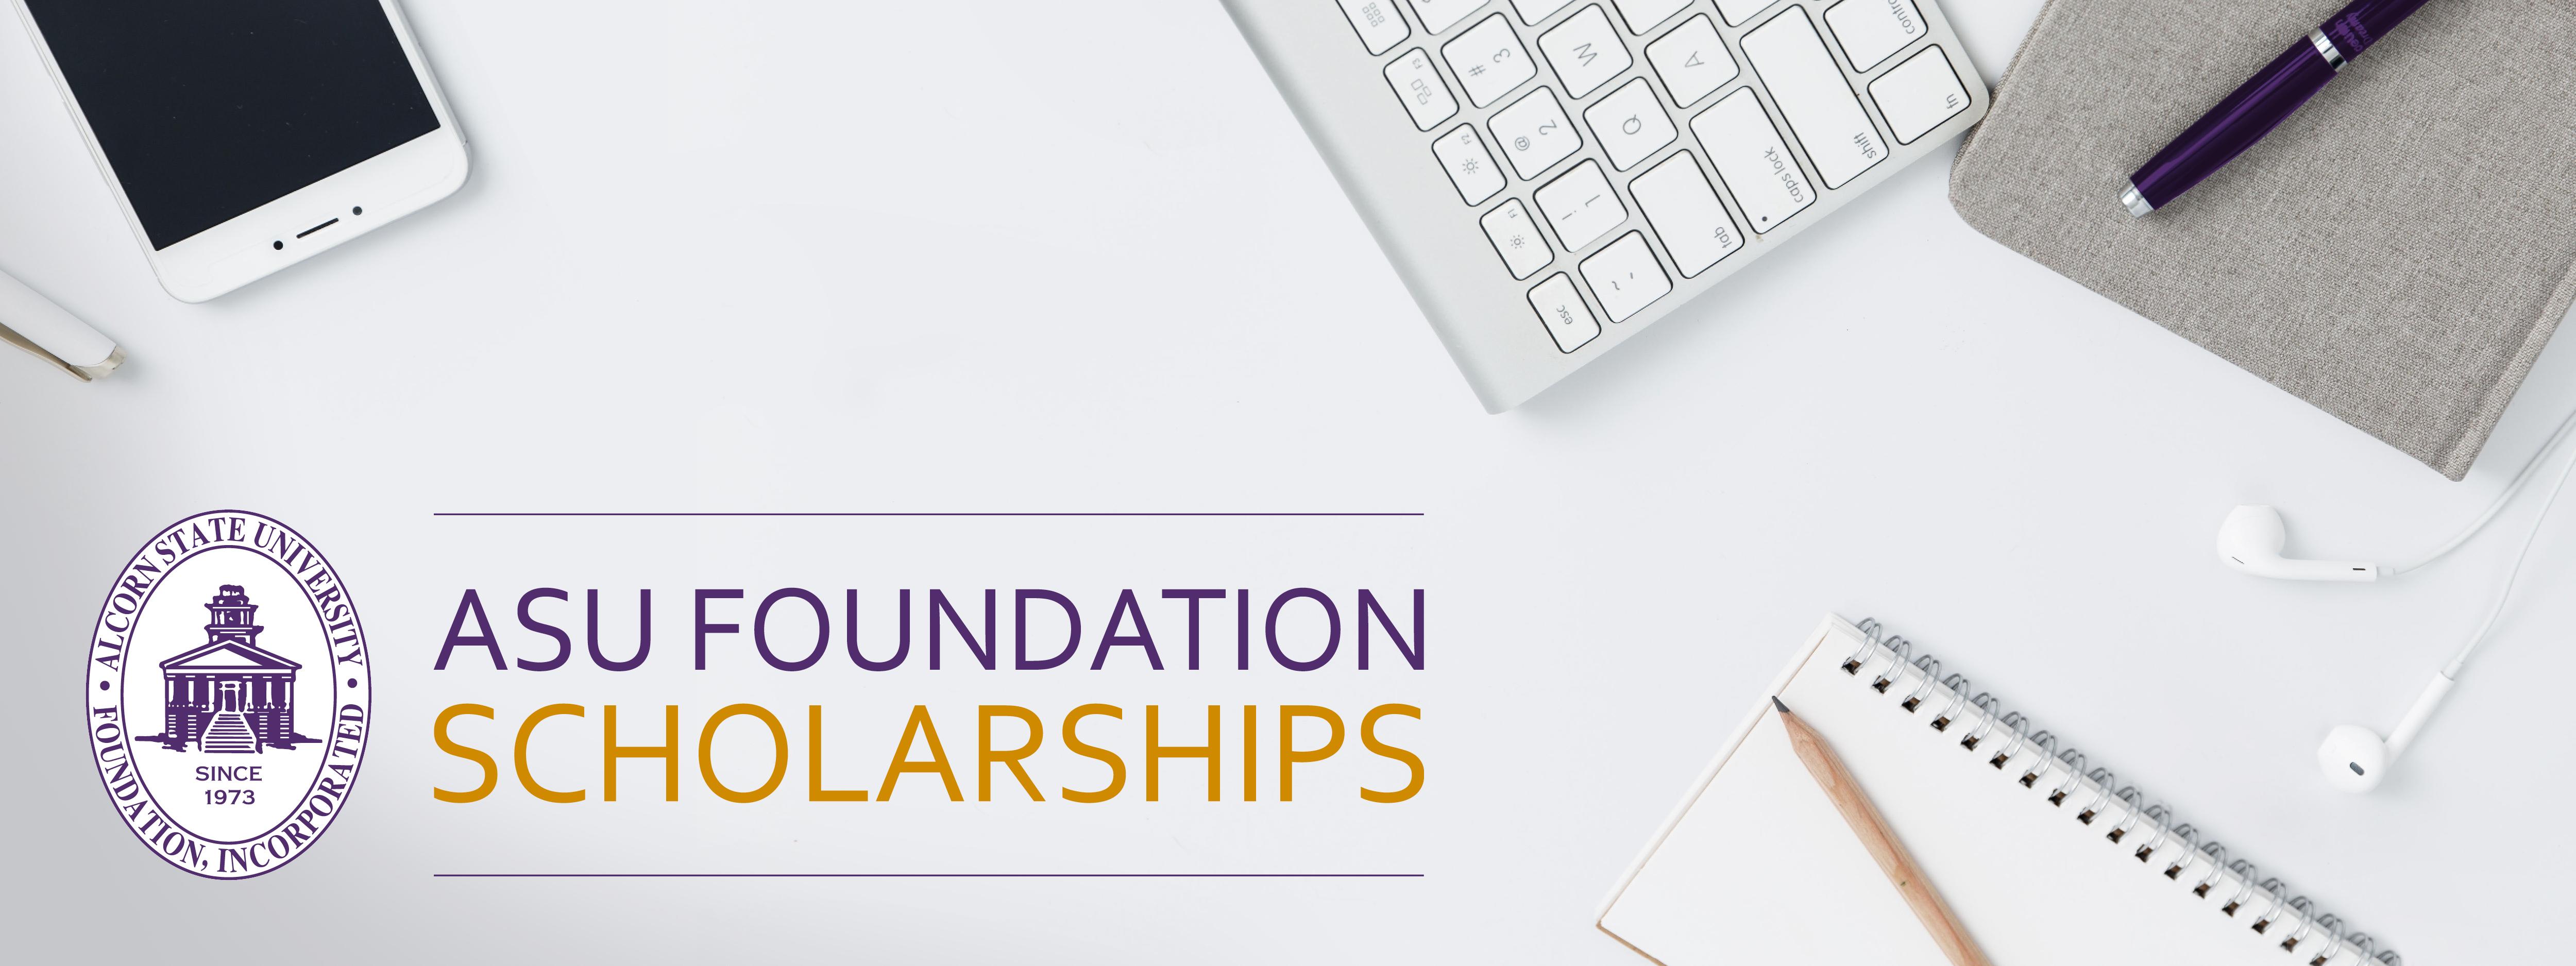 Asu Fall 2022 Calendar.Scholarships Phase I Alcorn State University